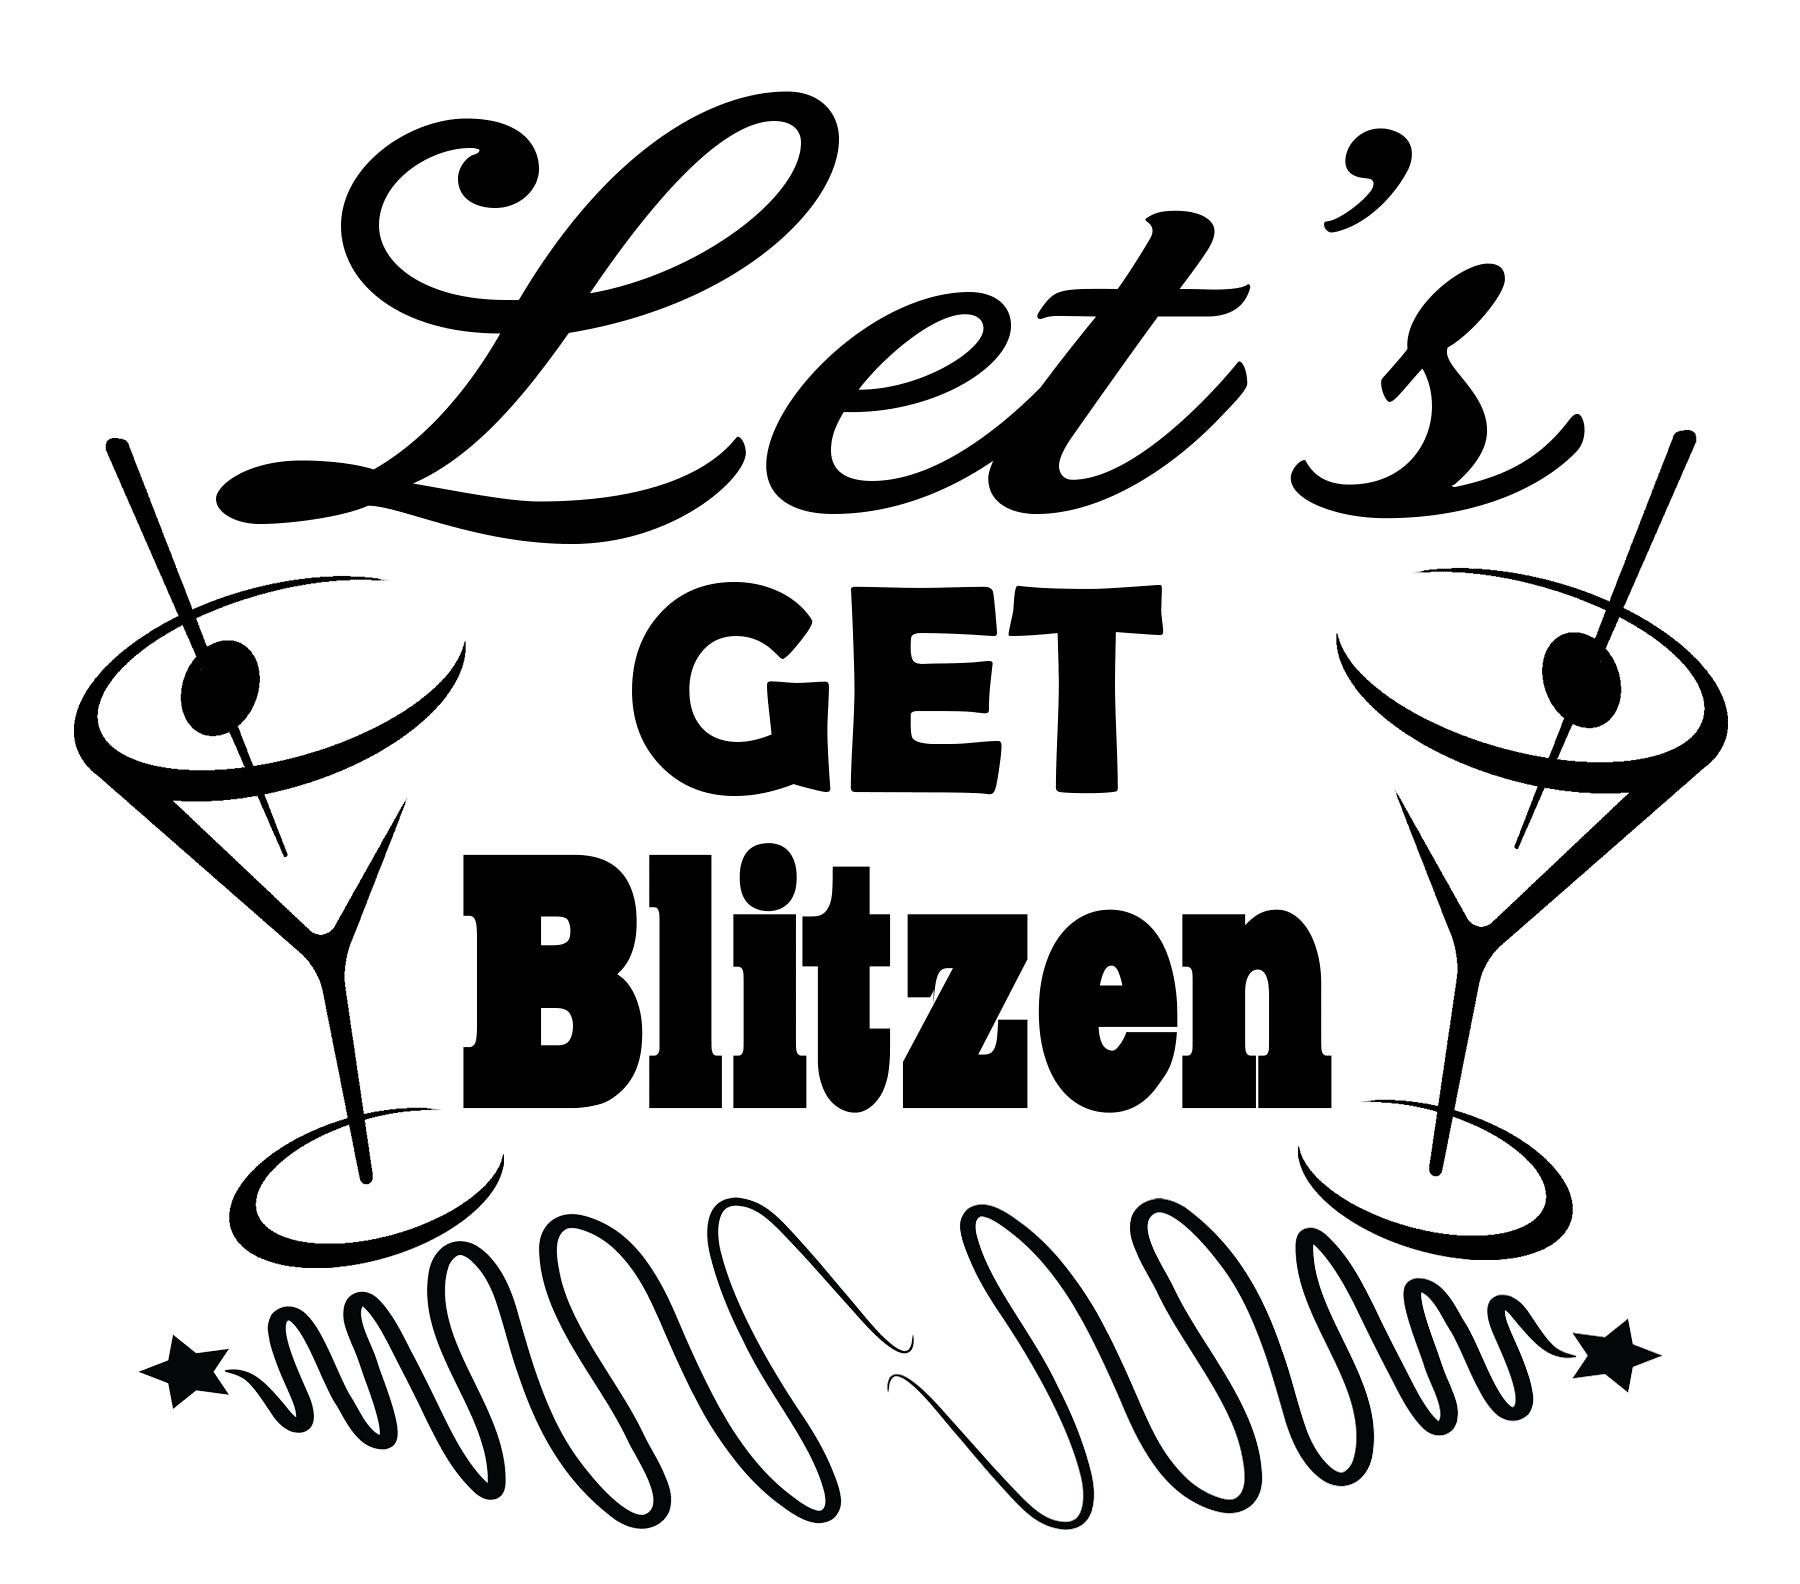 Free Blitzen SVG File